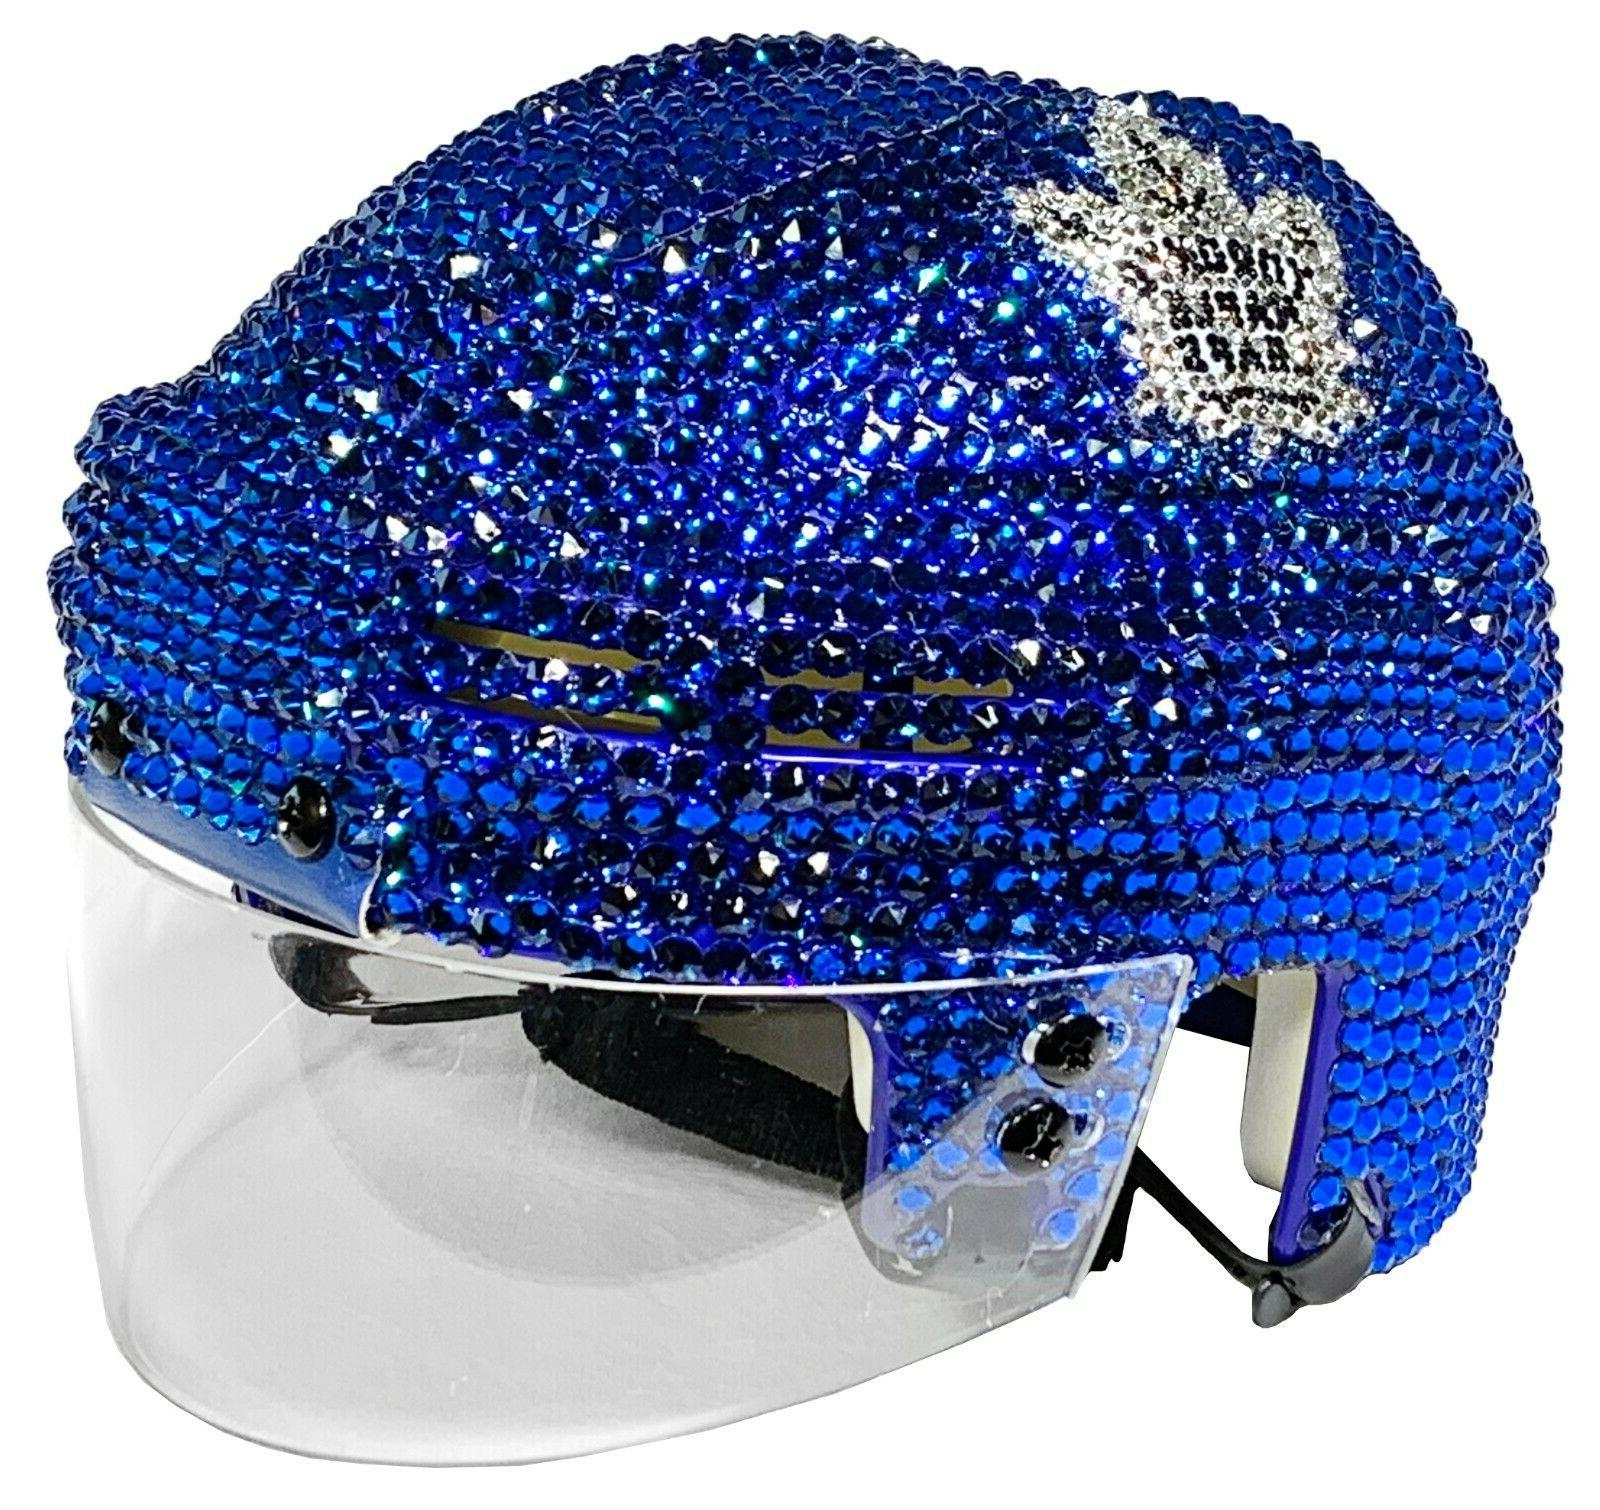 new nhl hockey mini helmet made